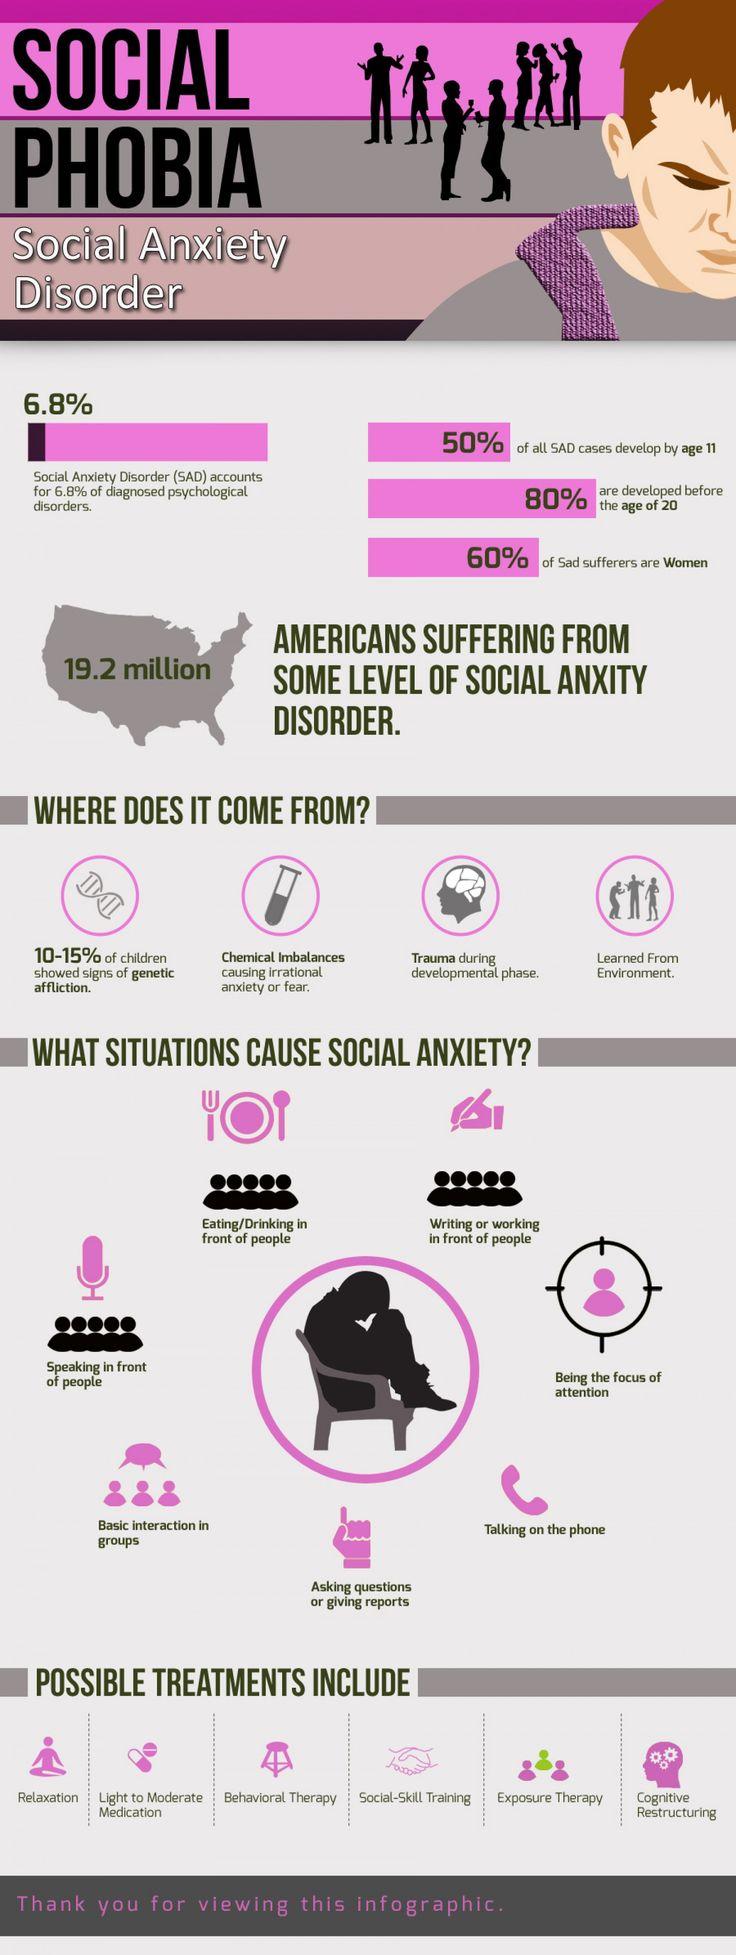 Social Anxiety Infographic, #anxiety #phobia #mentalhealth